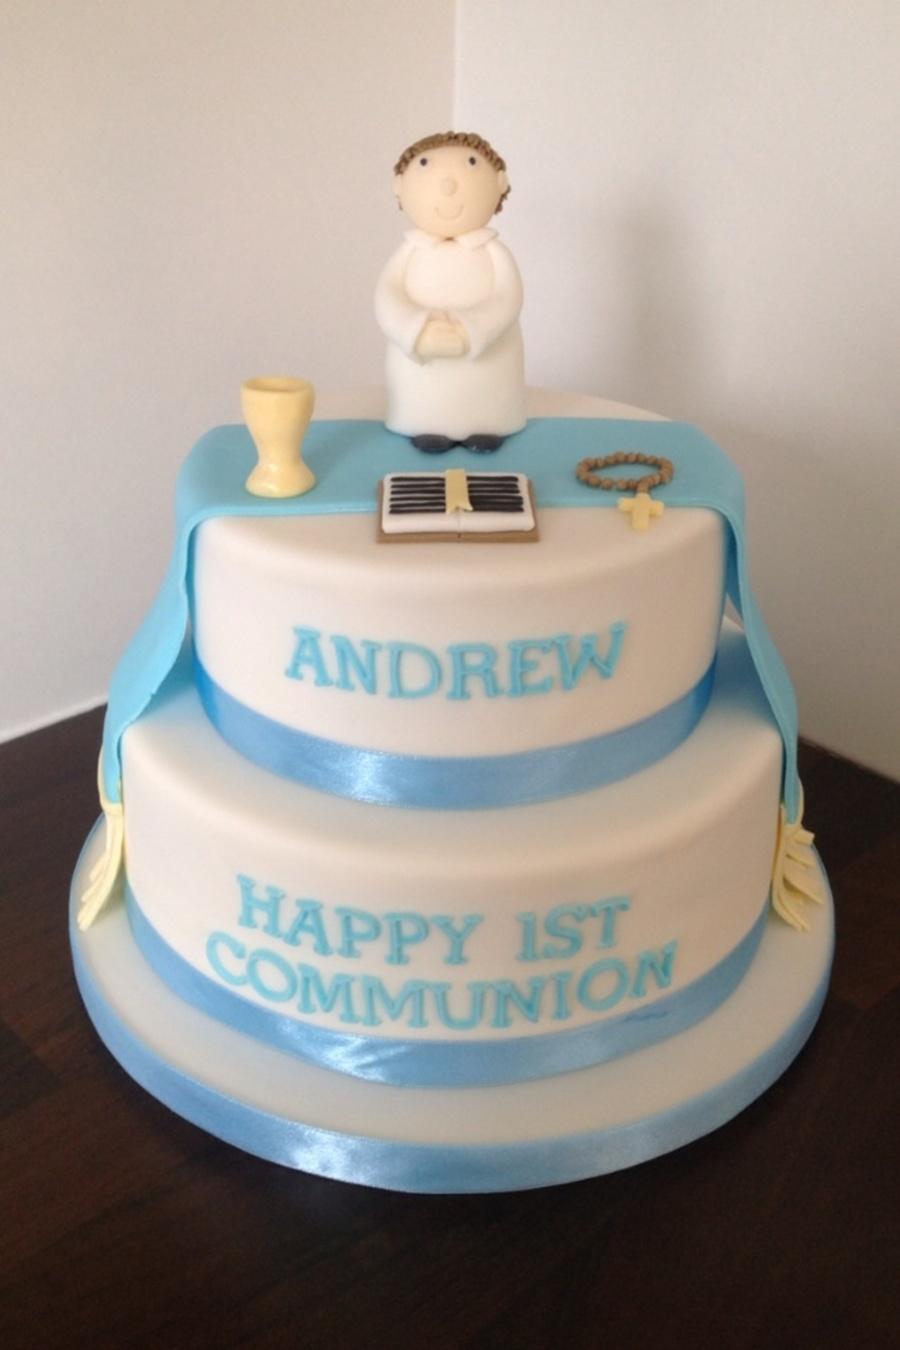 Cake Decorating Central Hours : Image - CakeCentral.com